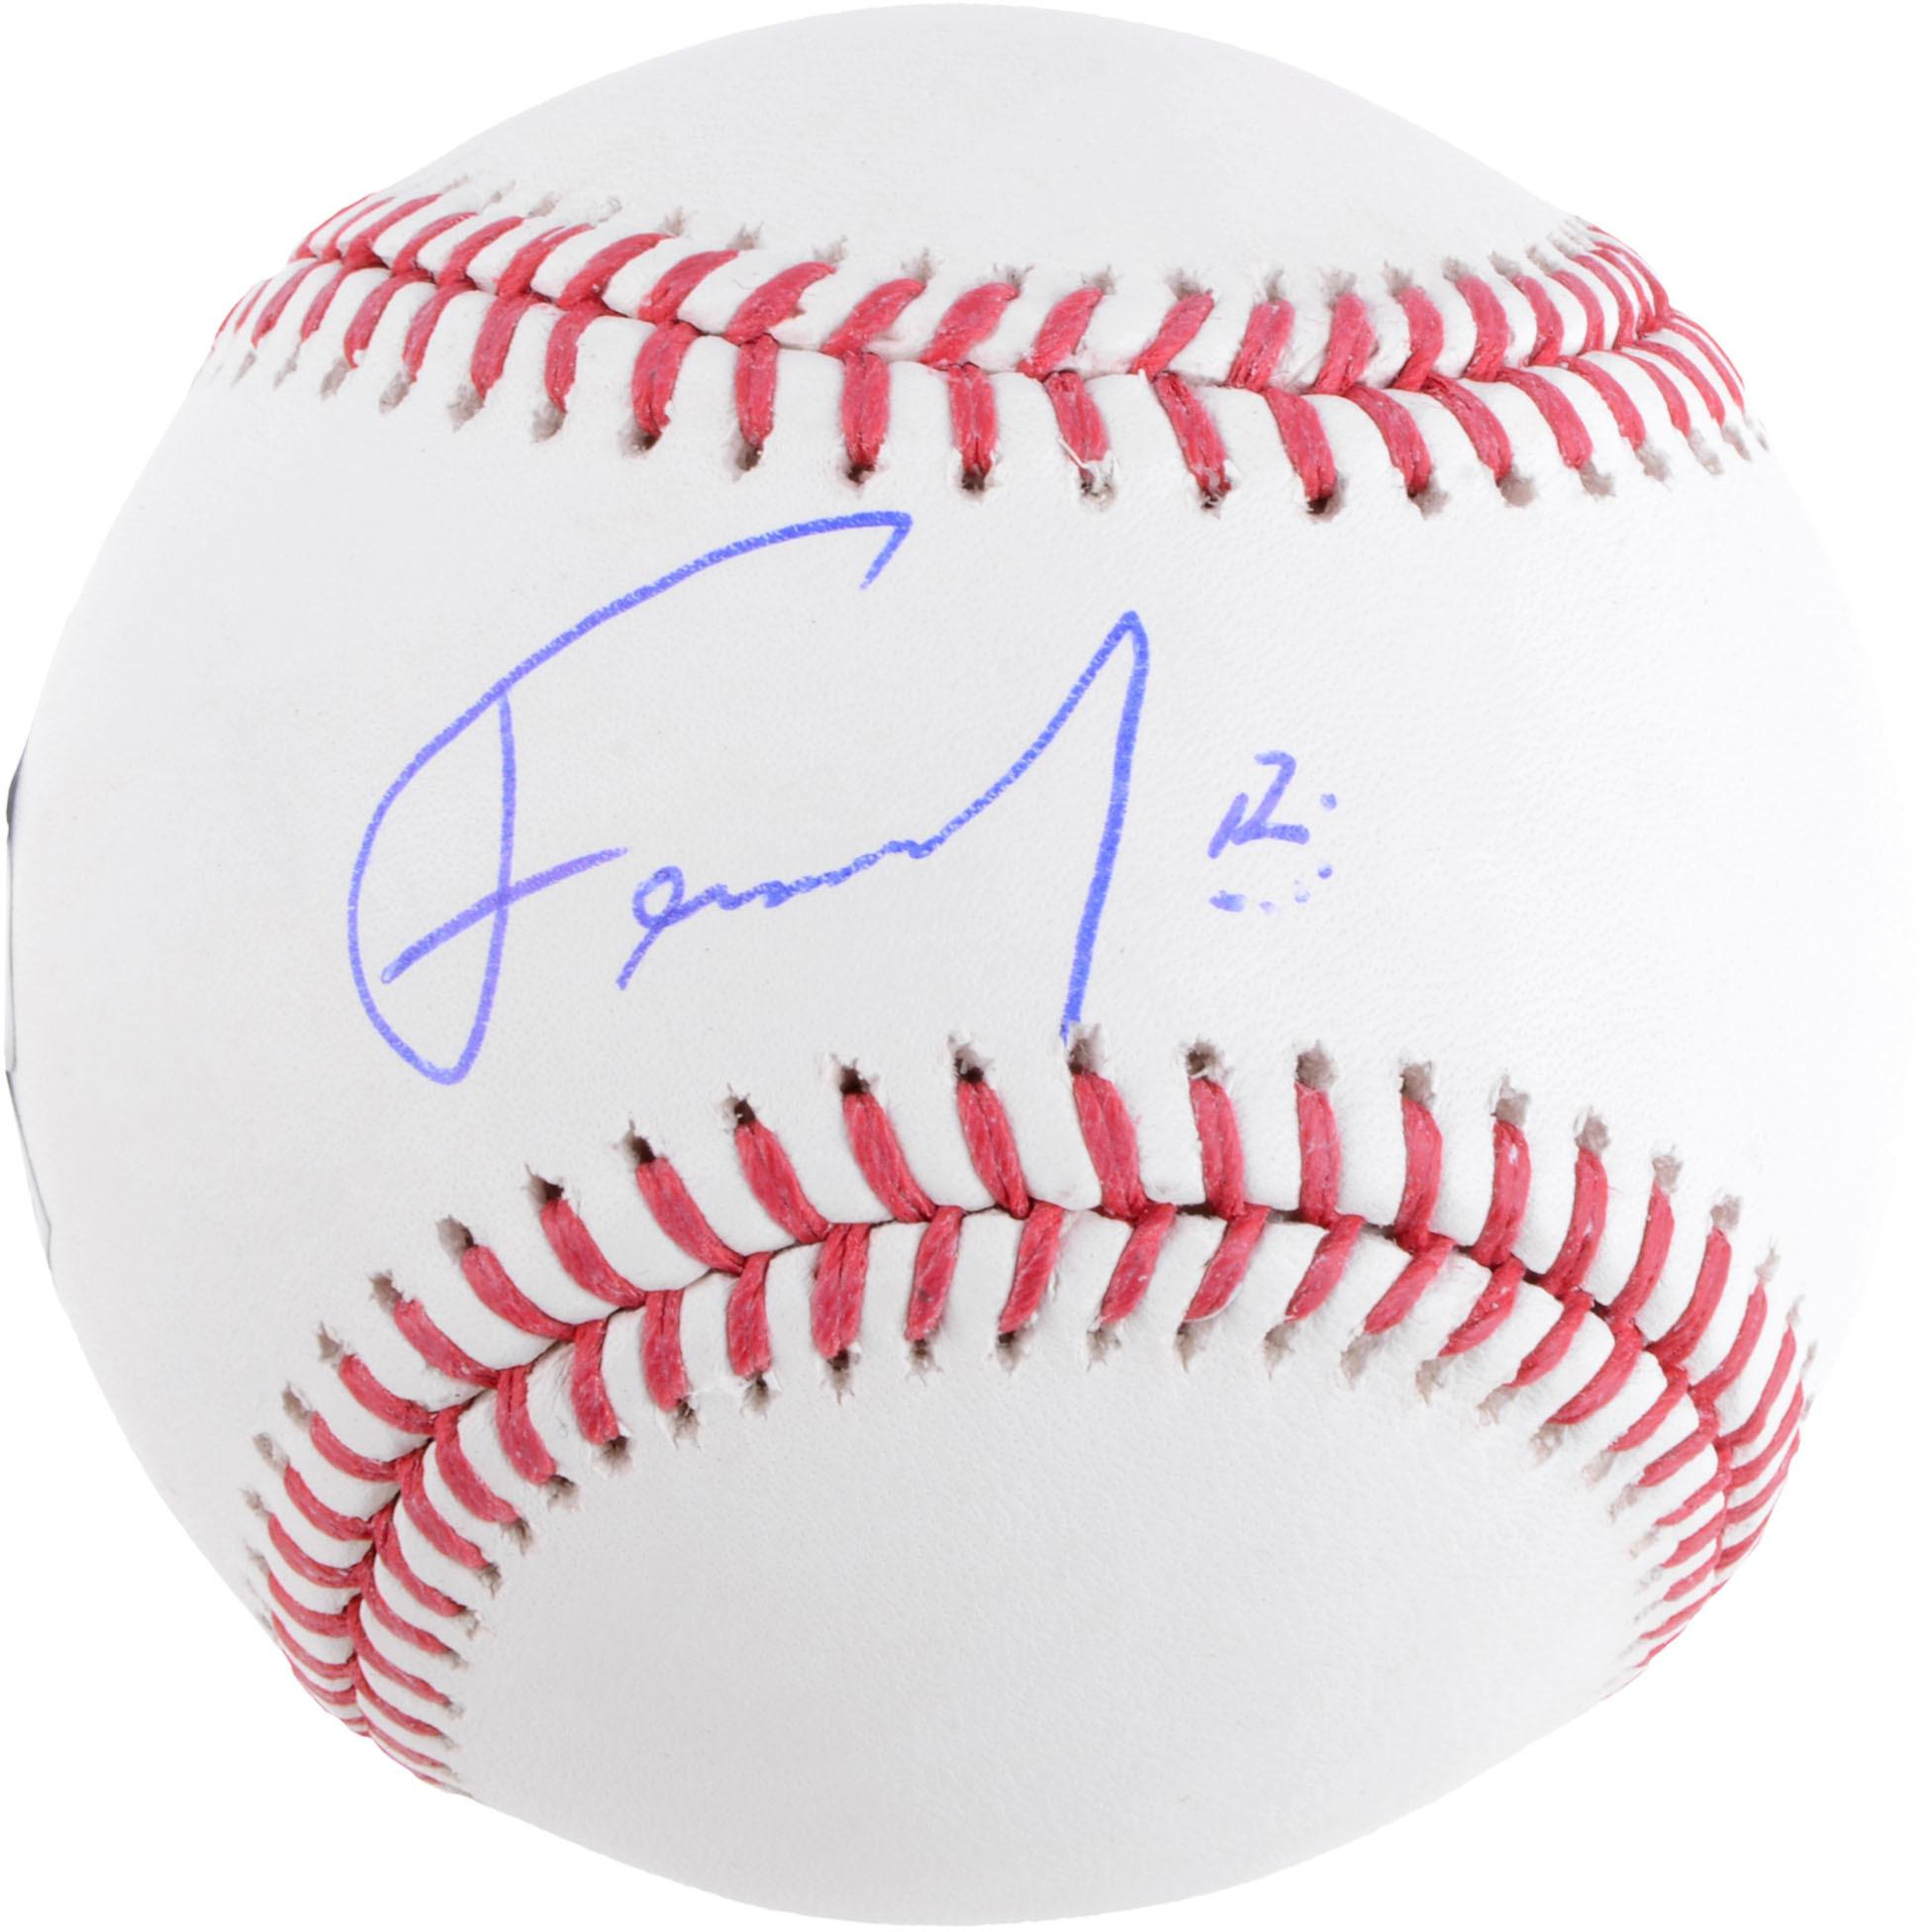 Fernando Romero Minnesota Twins Autographed Baseball - Fanatics Authentic Certified